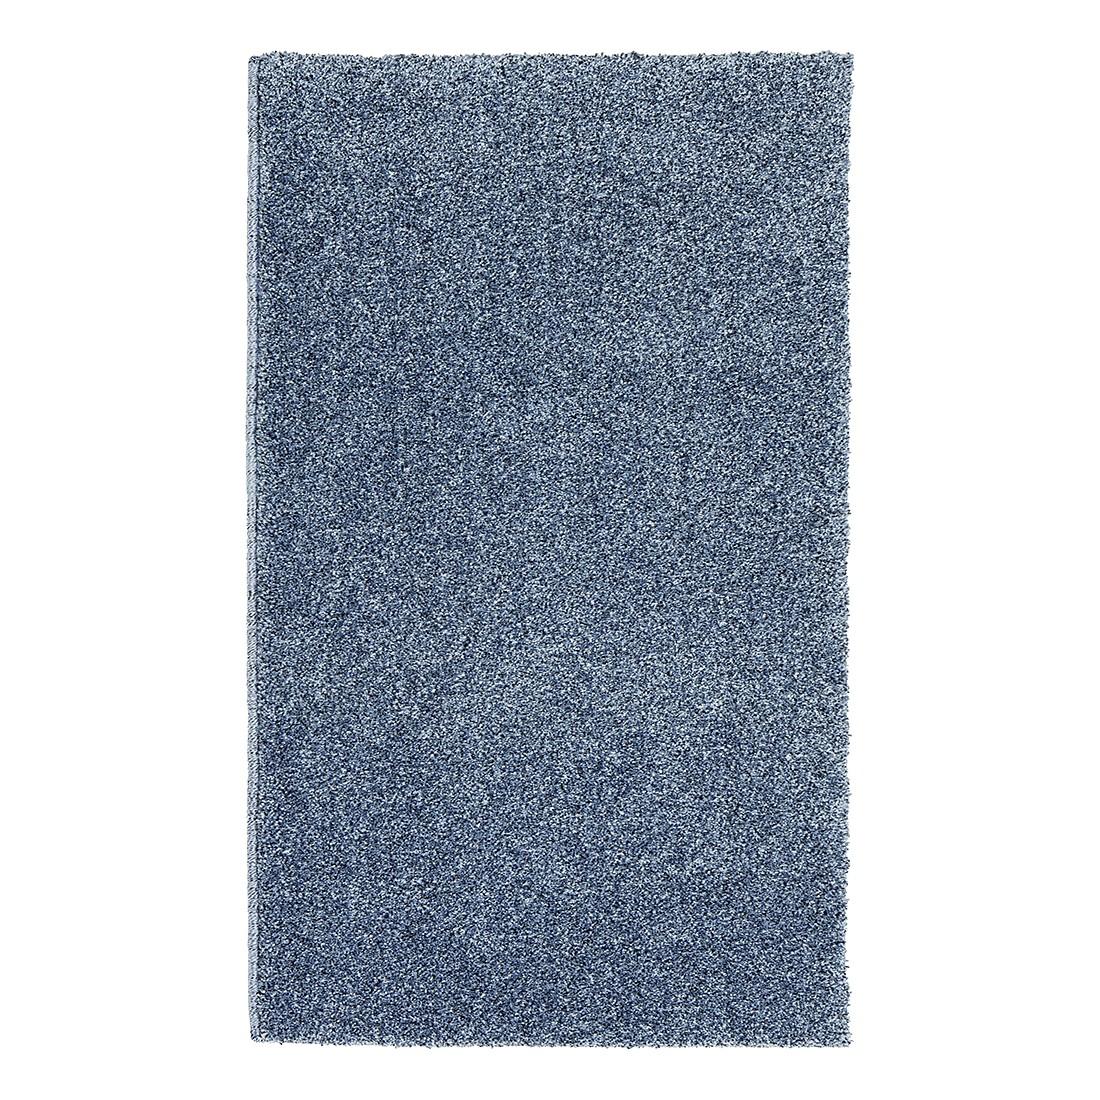 Teppich Samoa I - Blau - 200 x 290 cm, Astra